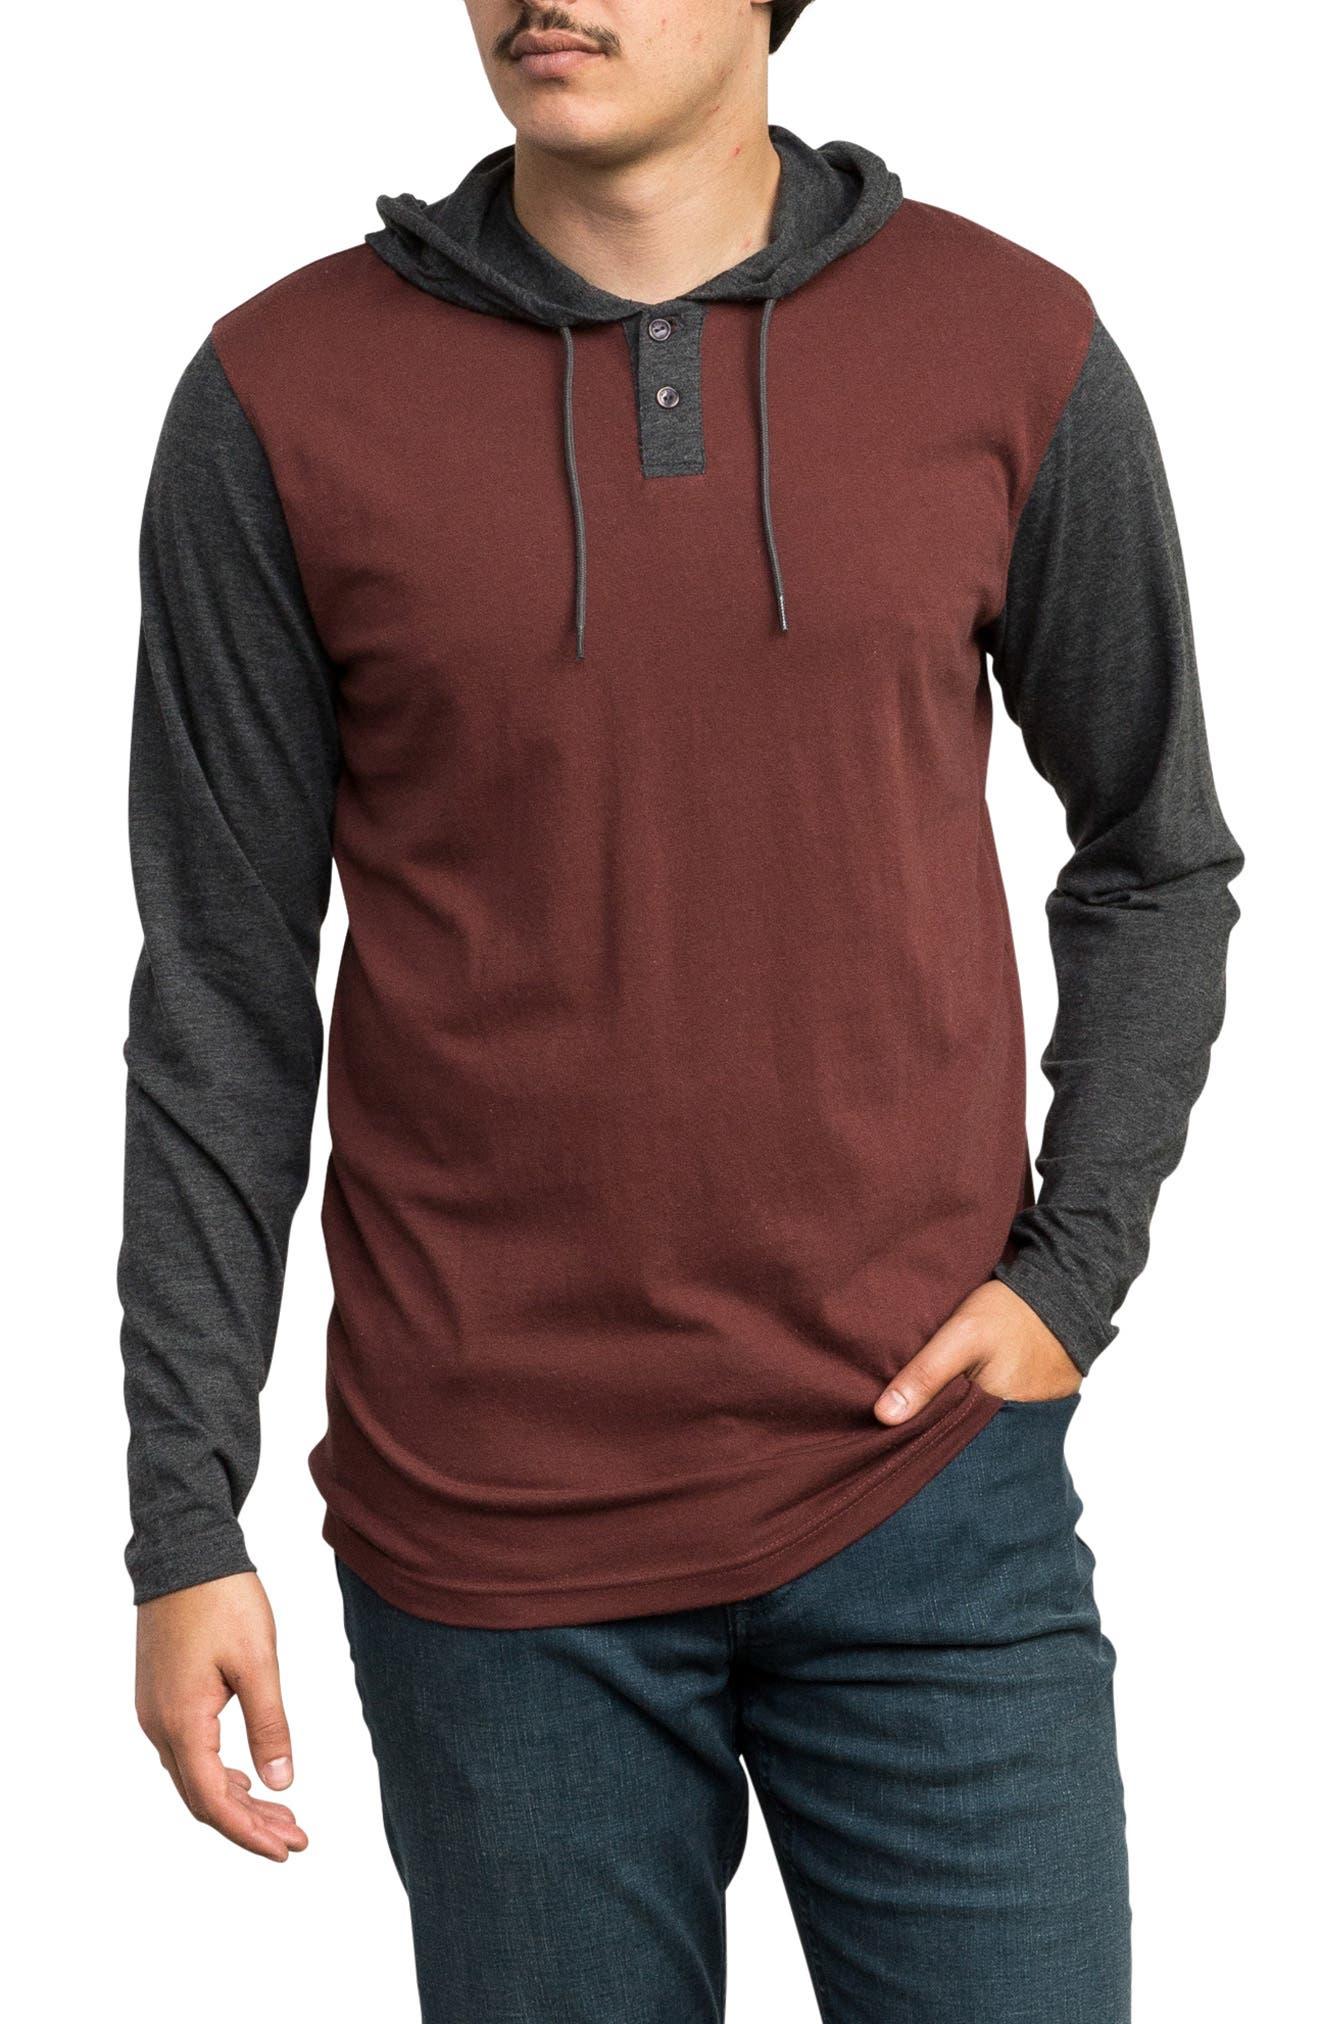 Rvca Pick Up Hooded Henley Sweatshirt, Burgundy